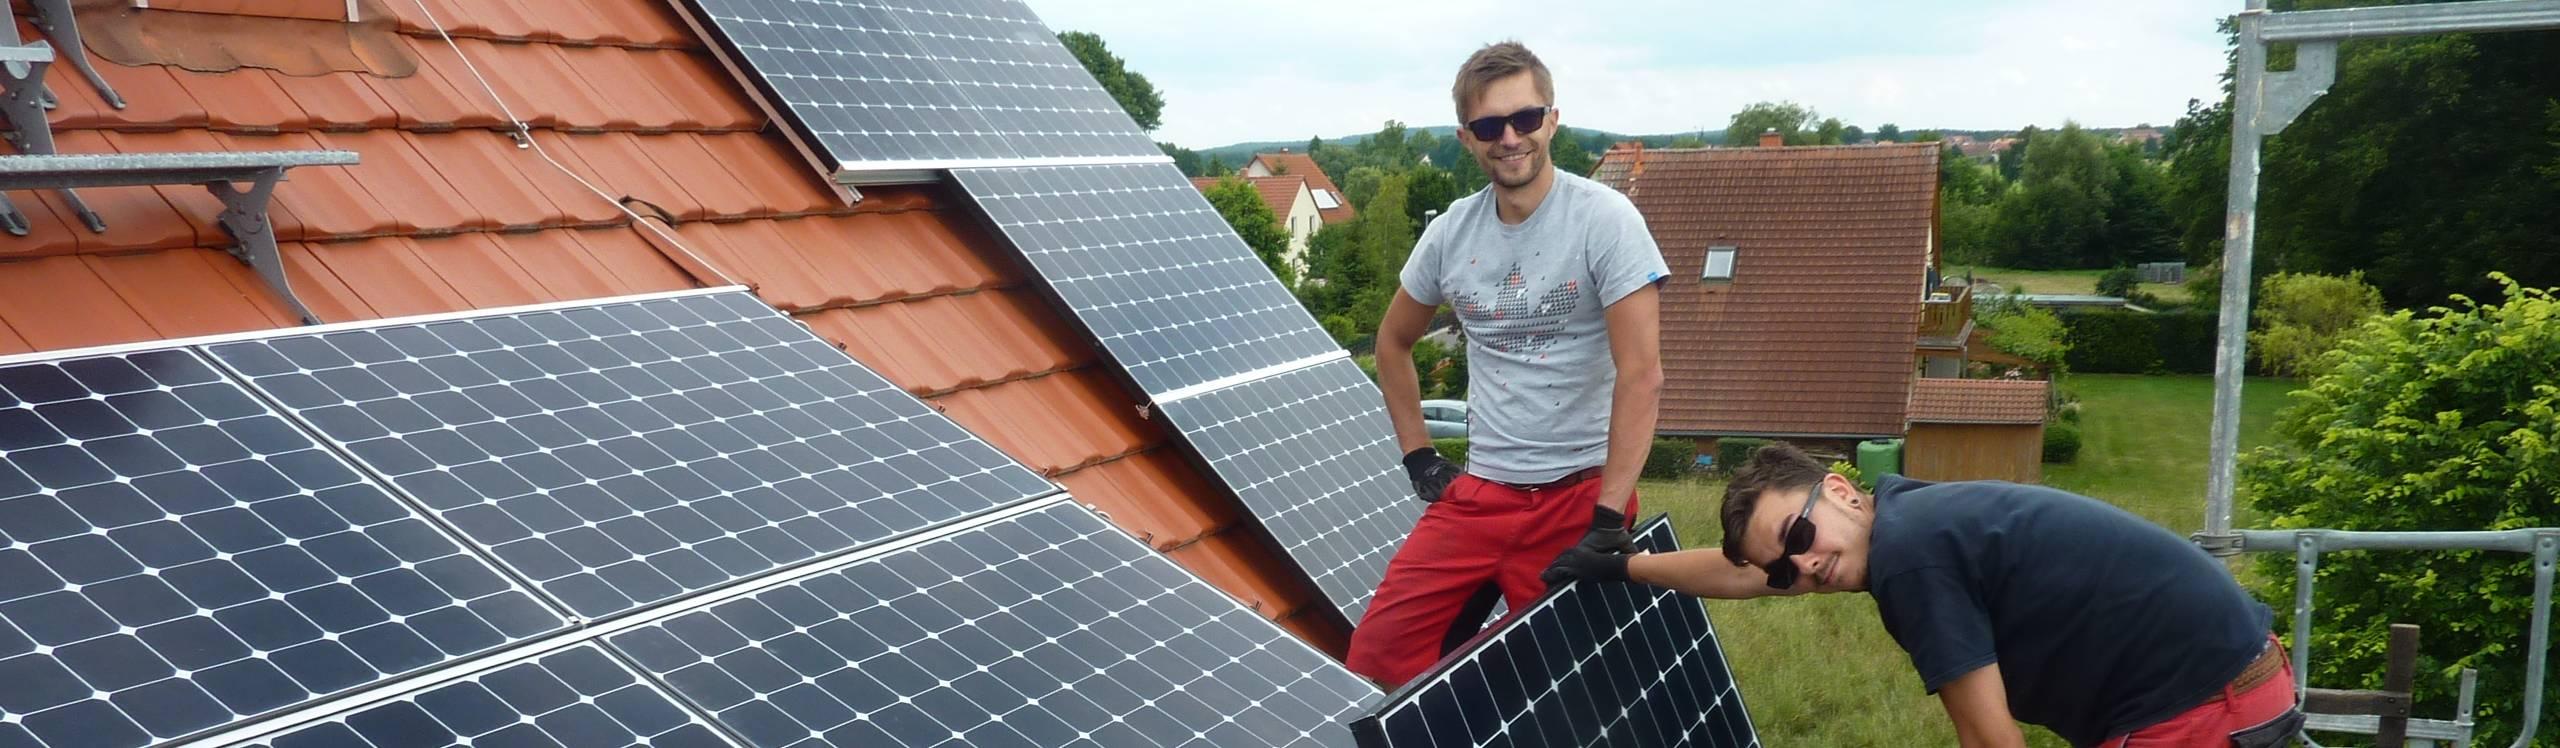 Solarsysteme Sachsen GmbH